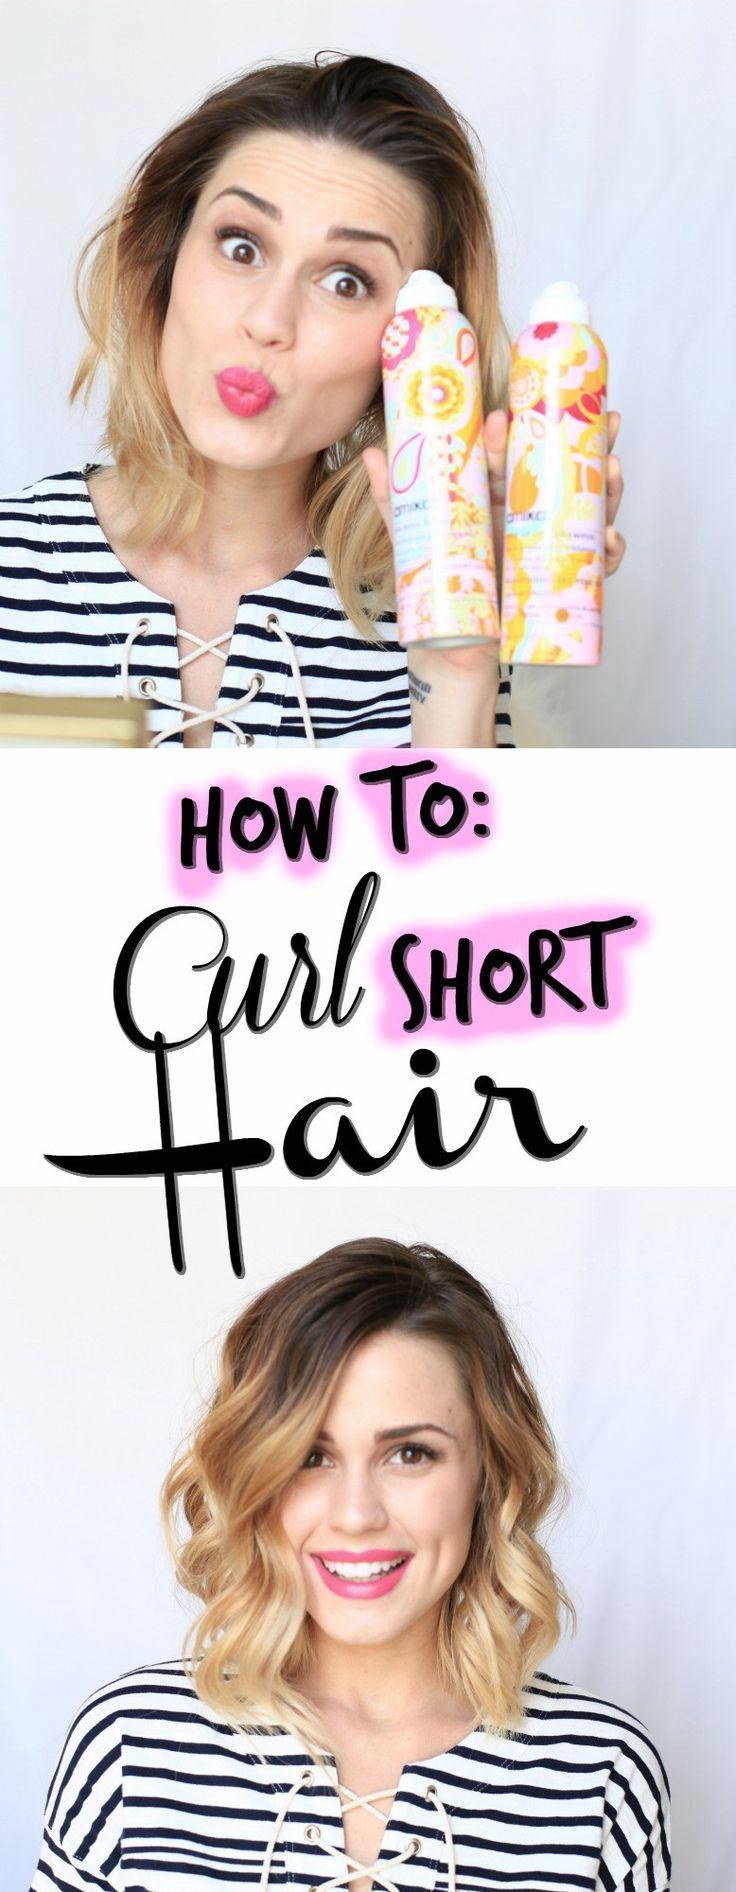 How to Curl Your Bob | Curls for short hair | How to curl short hair | Uptown with Elly Brown #shorthaircurls #curls #lob #bob